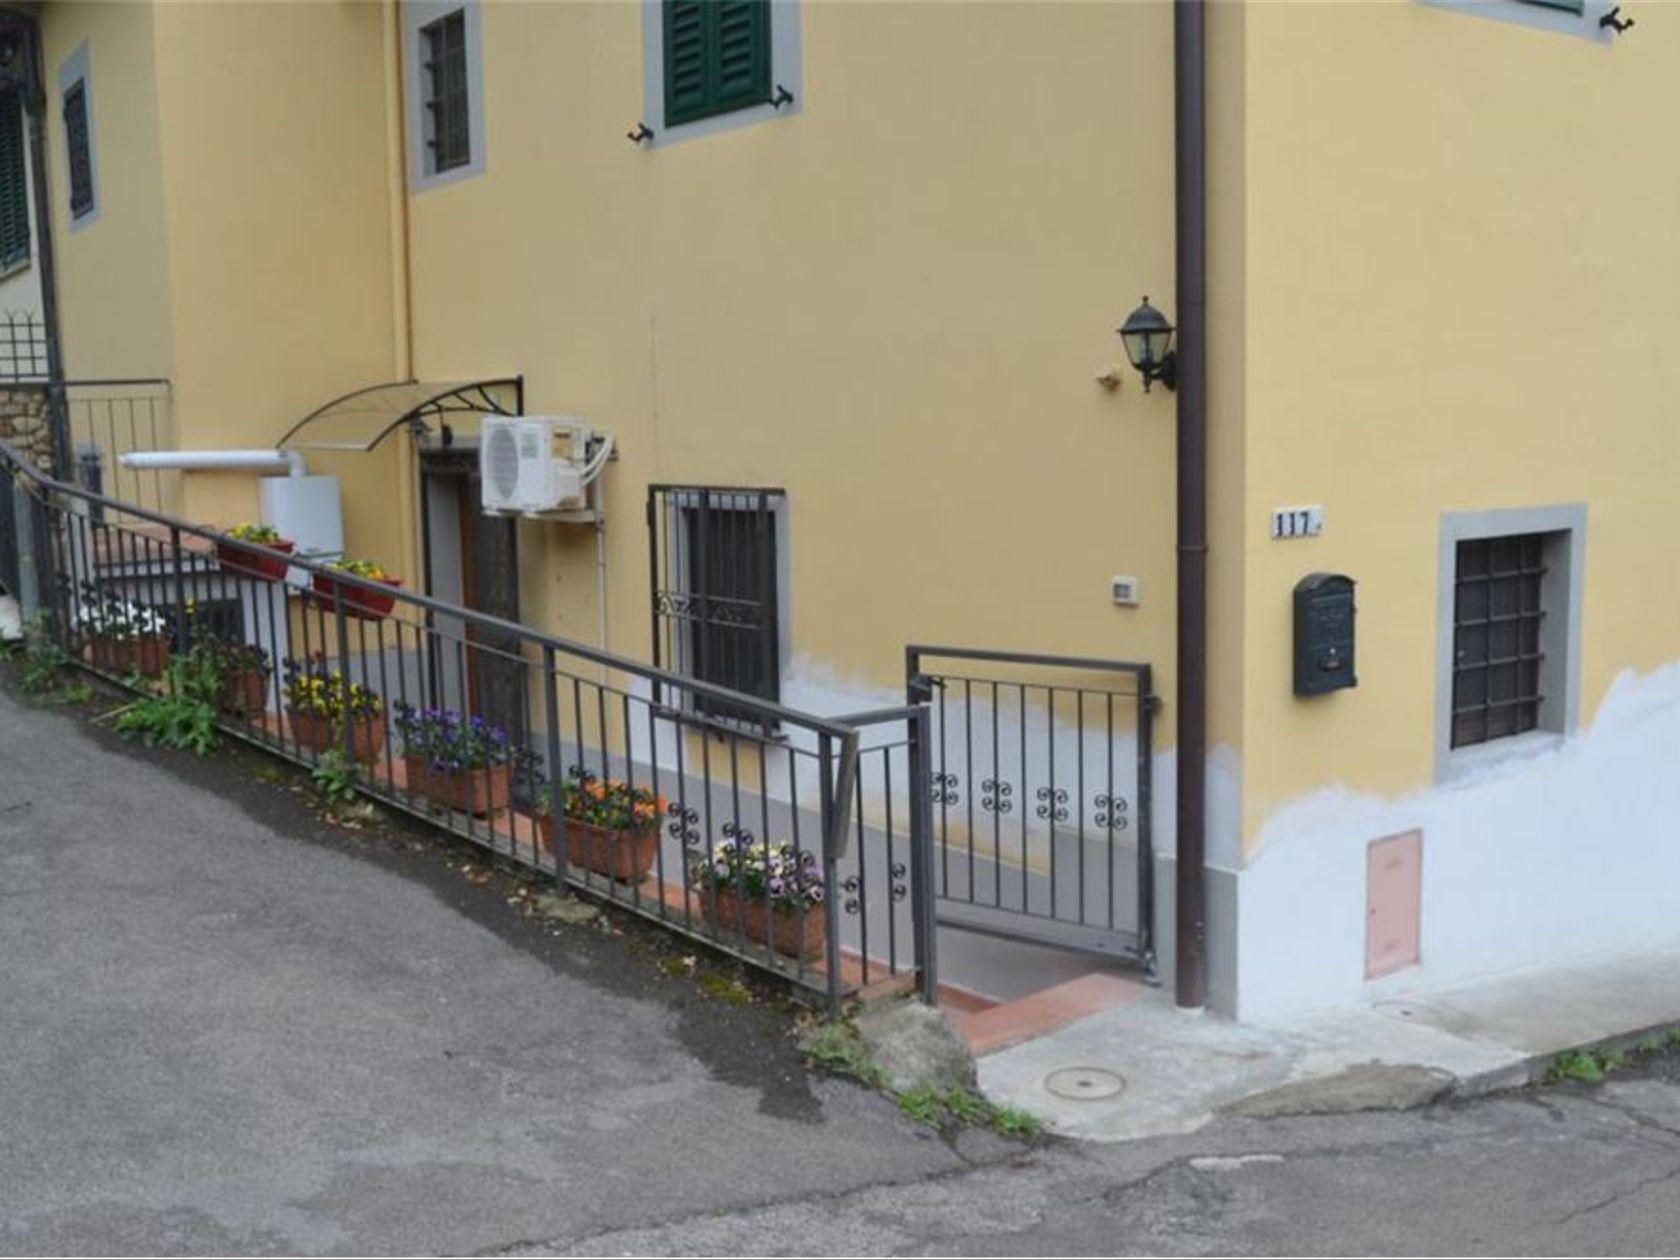 Appartamento Firenze - Firenze Sud Gavinana Europa, Firenze, FI Vendita - Foto 8